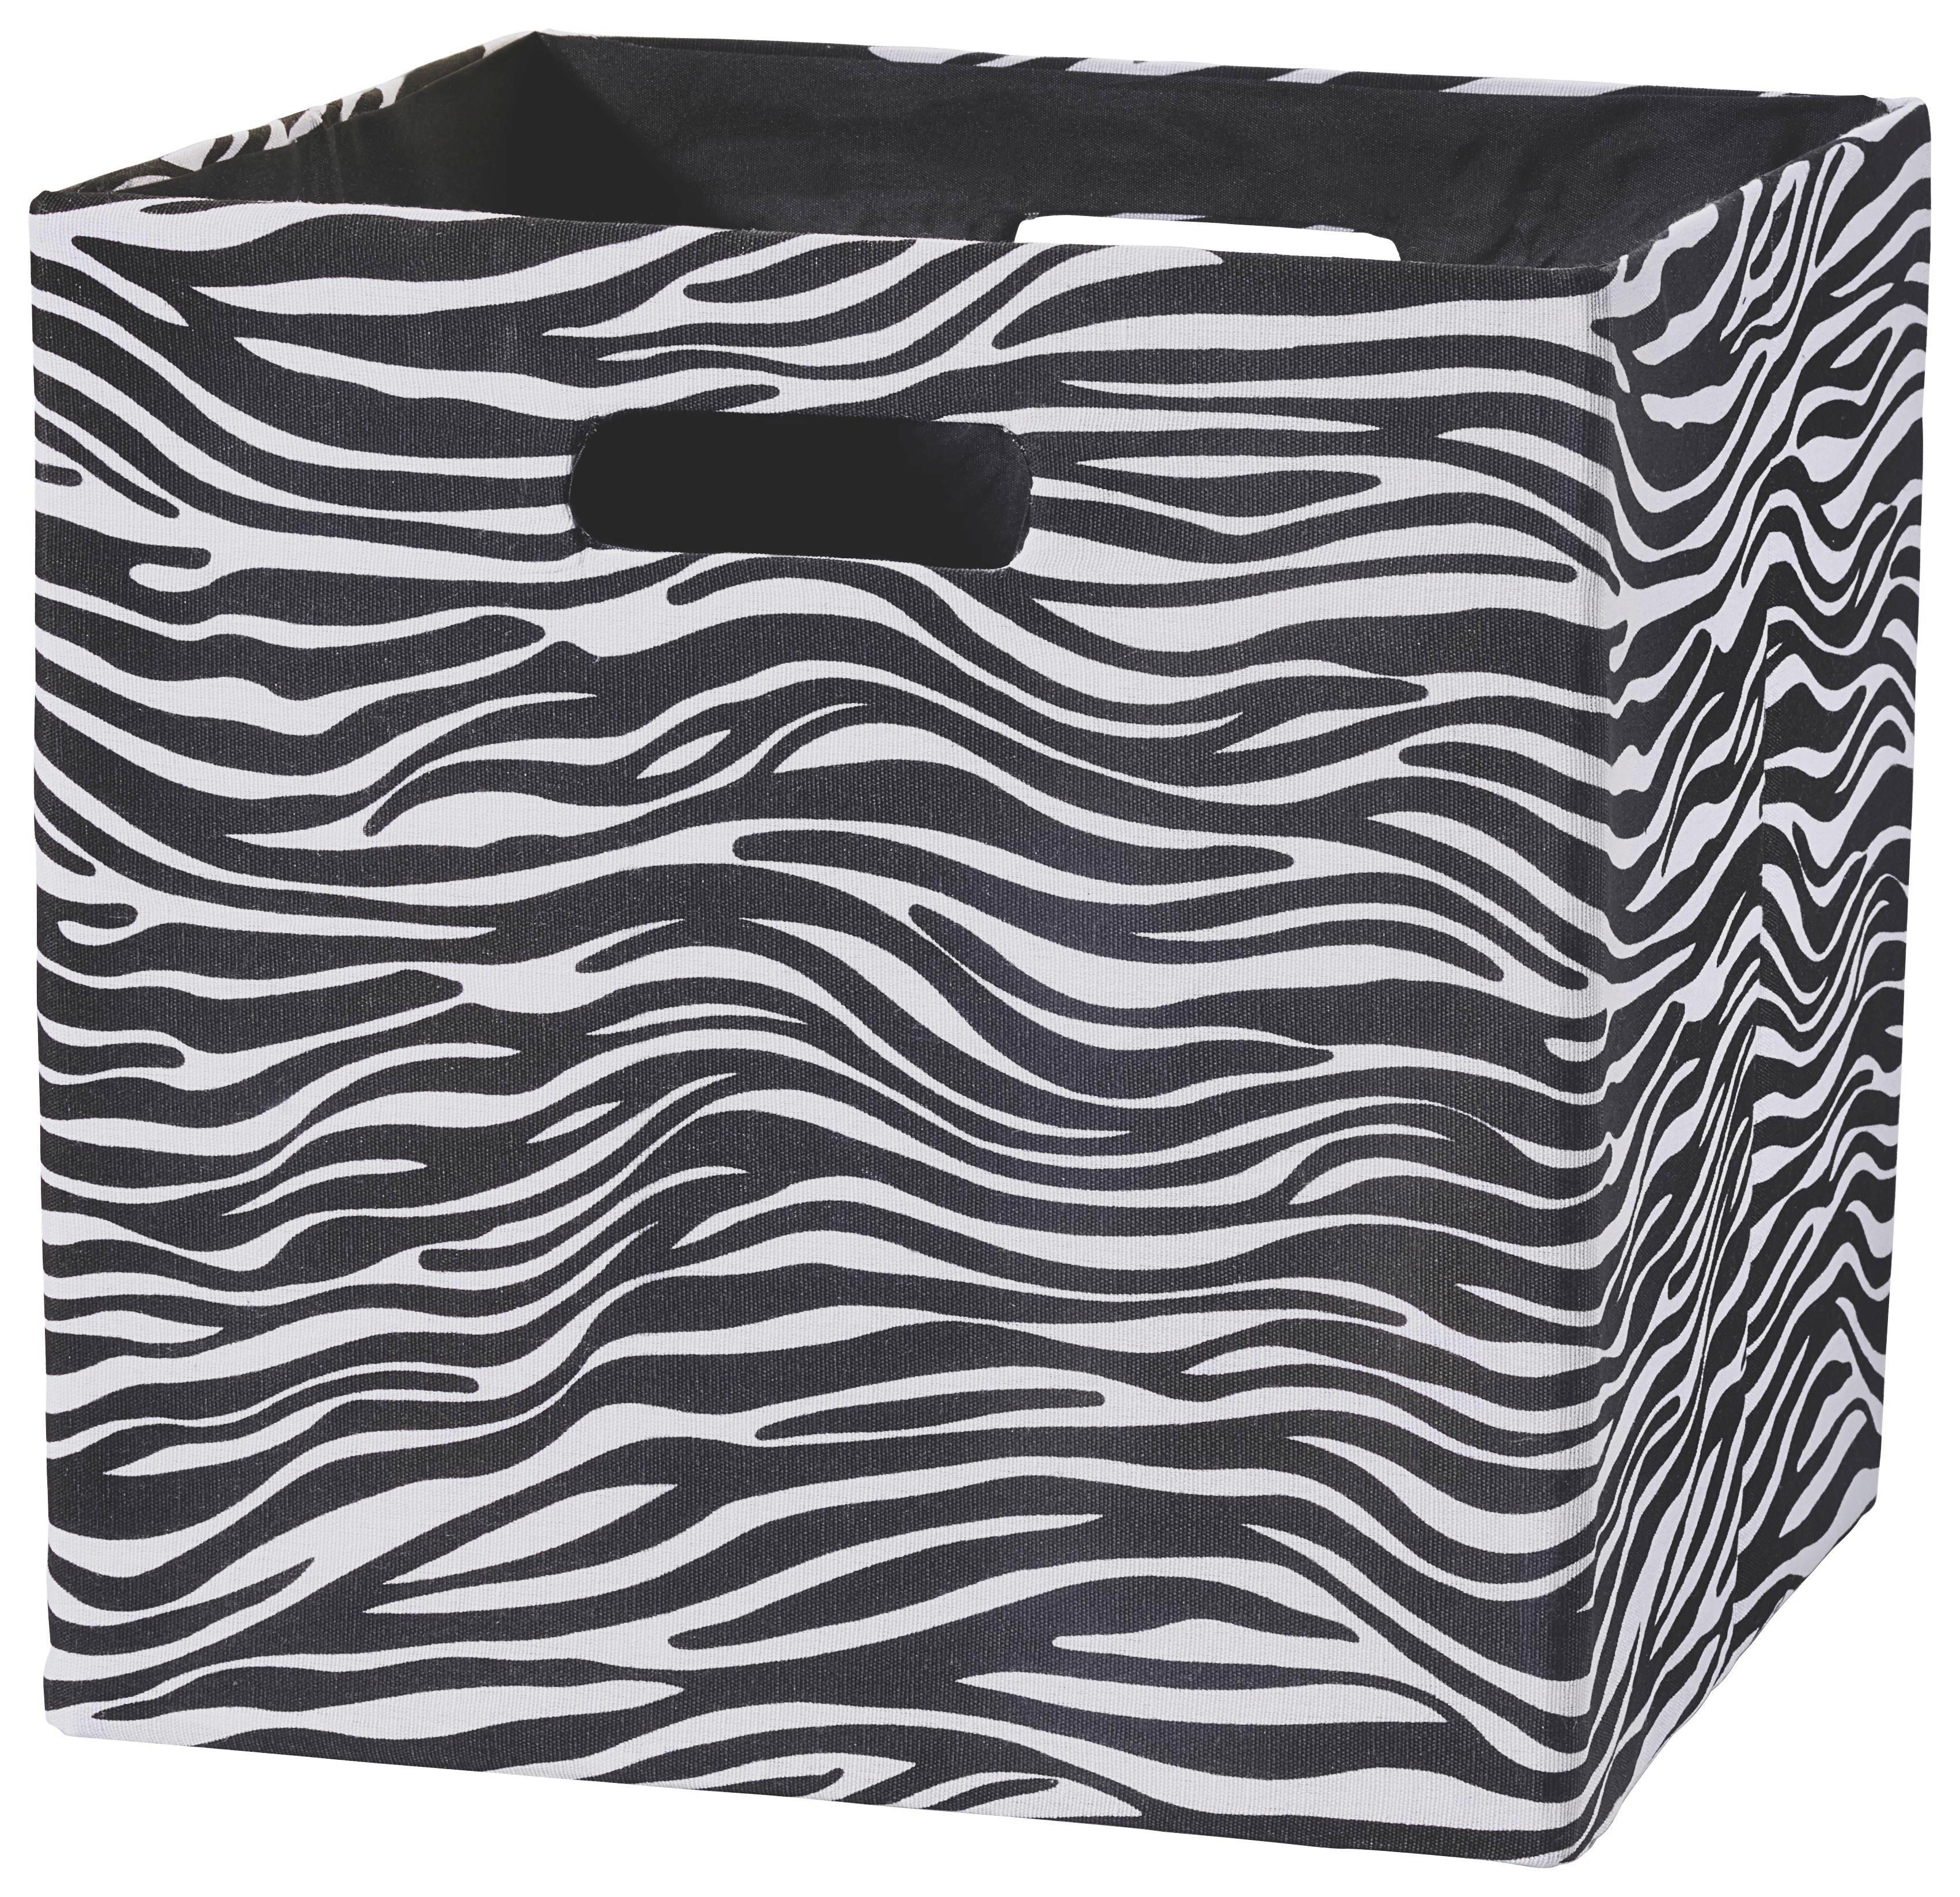 Tárolódoboz Bobby - fekete/fehér, modern, textil (33/33/32cm) - MÖMAX modern living